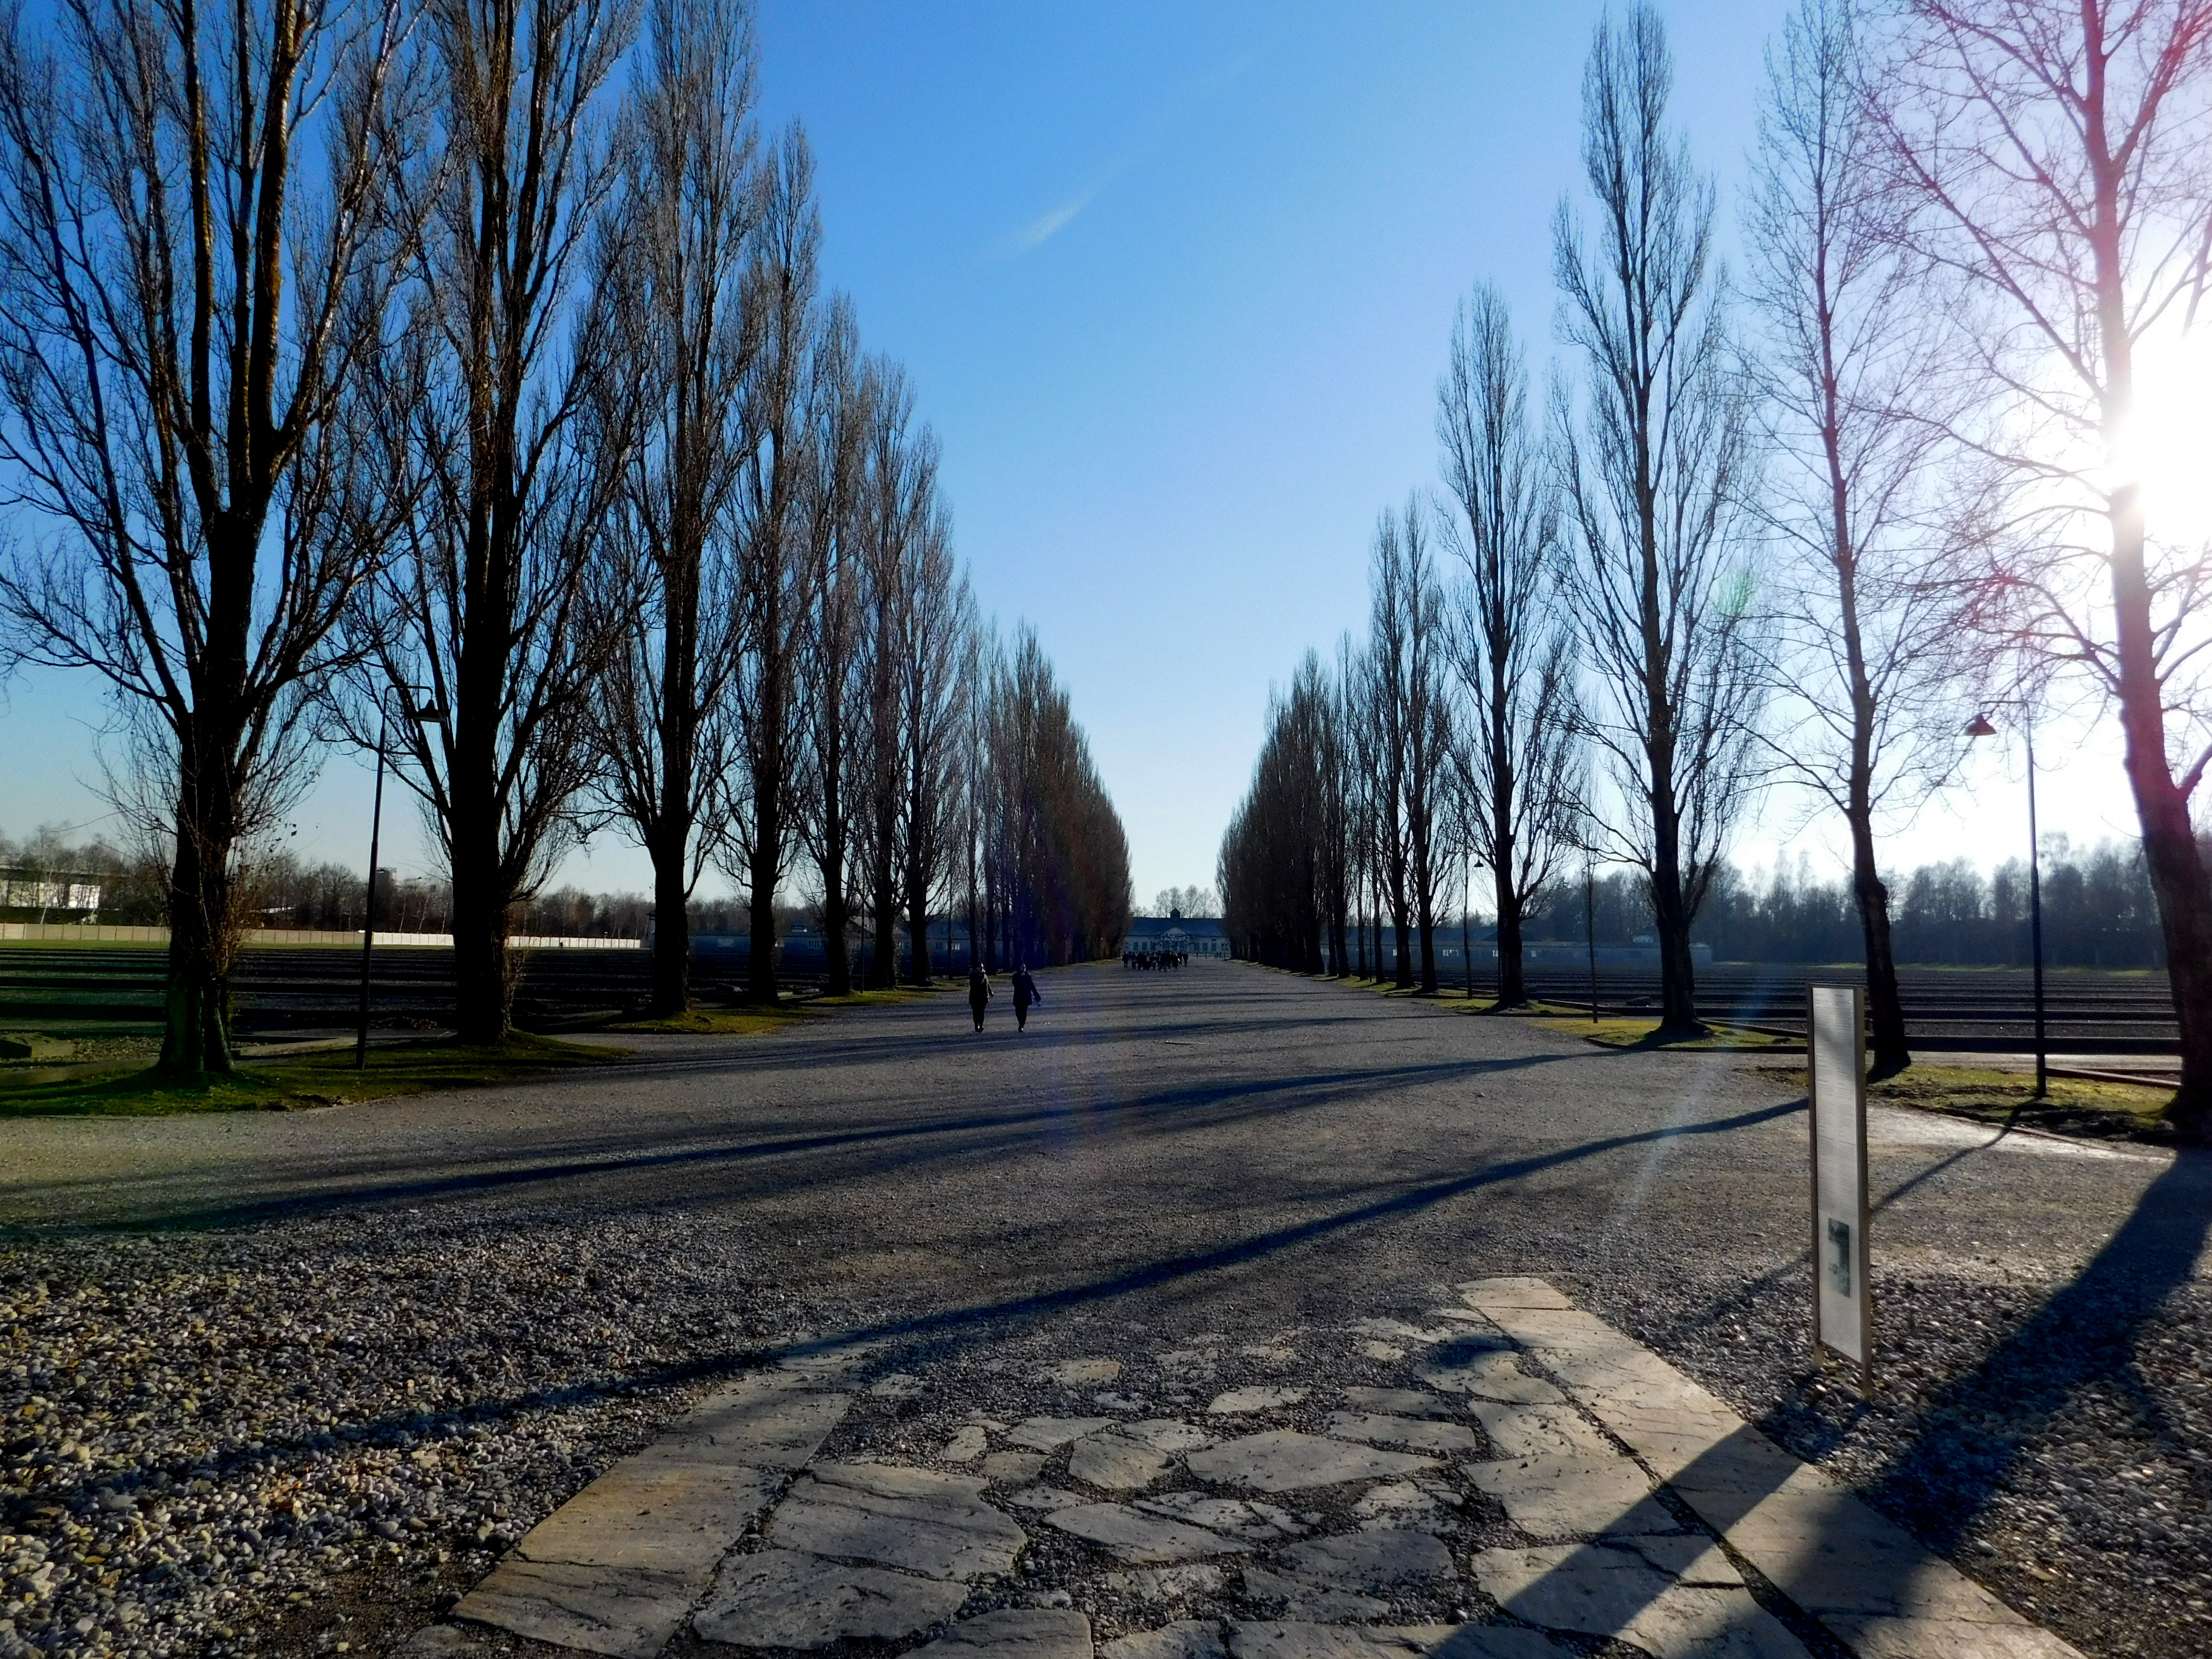 Dachau trees